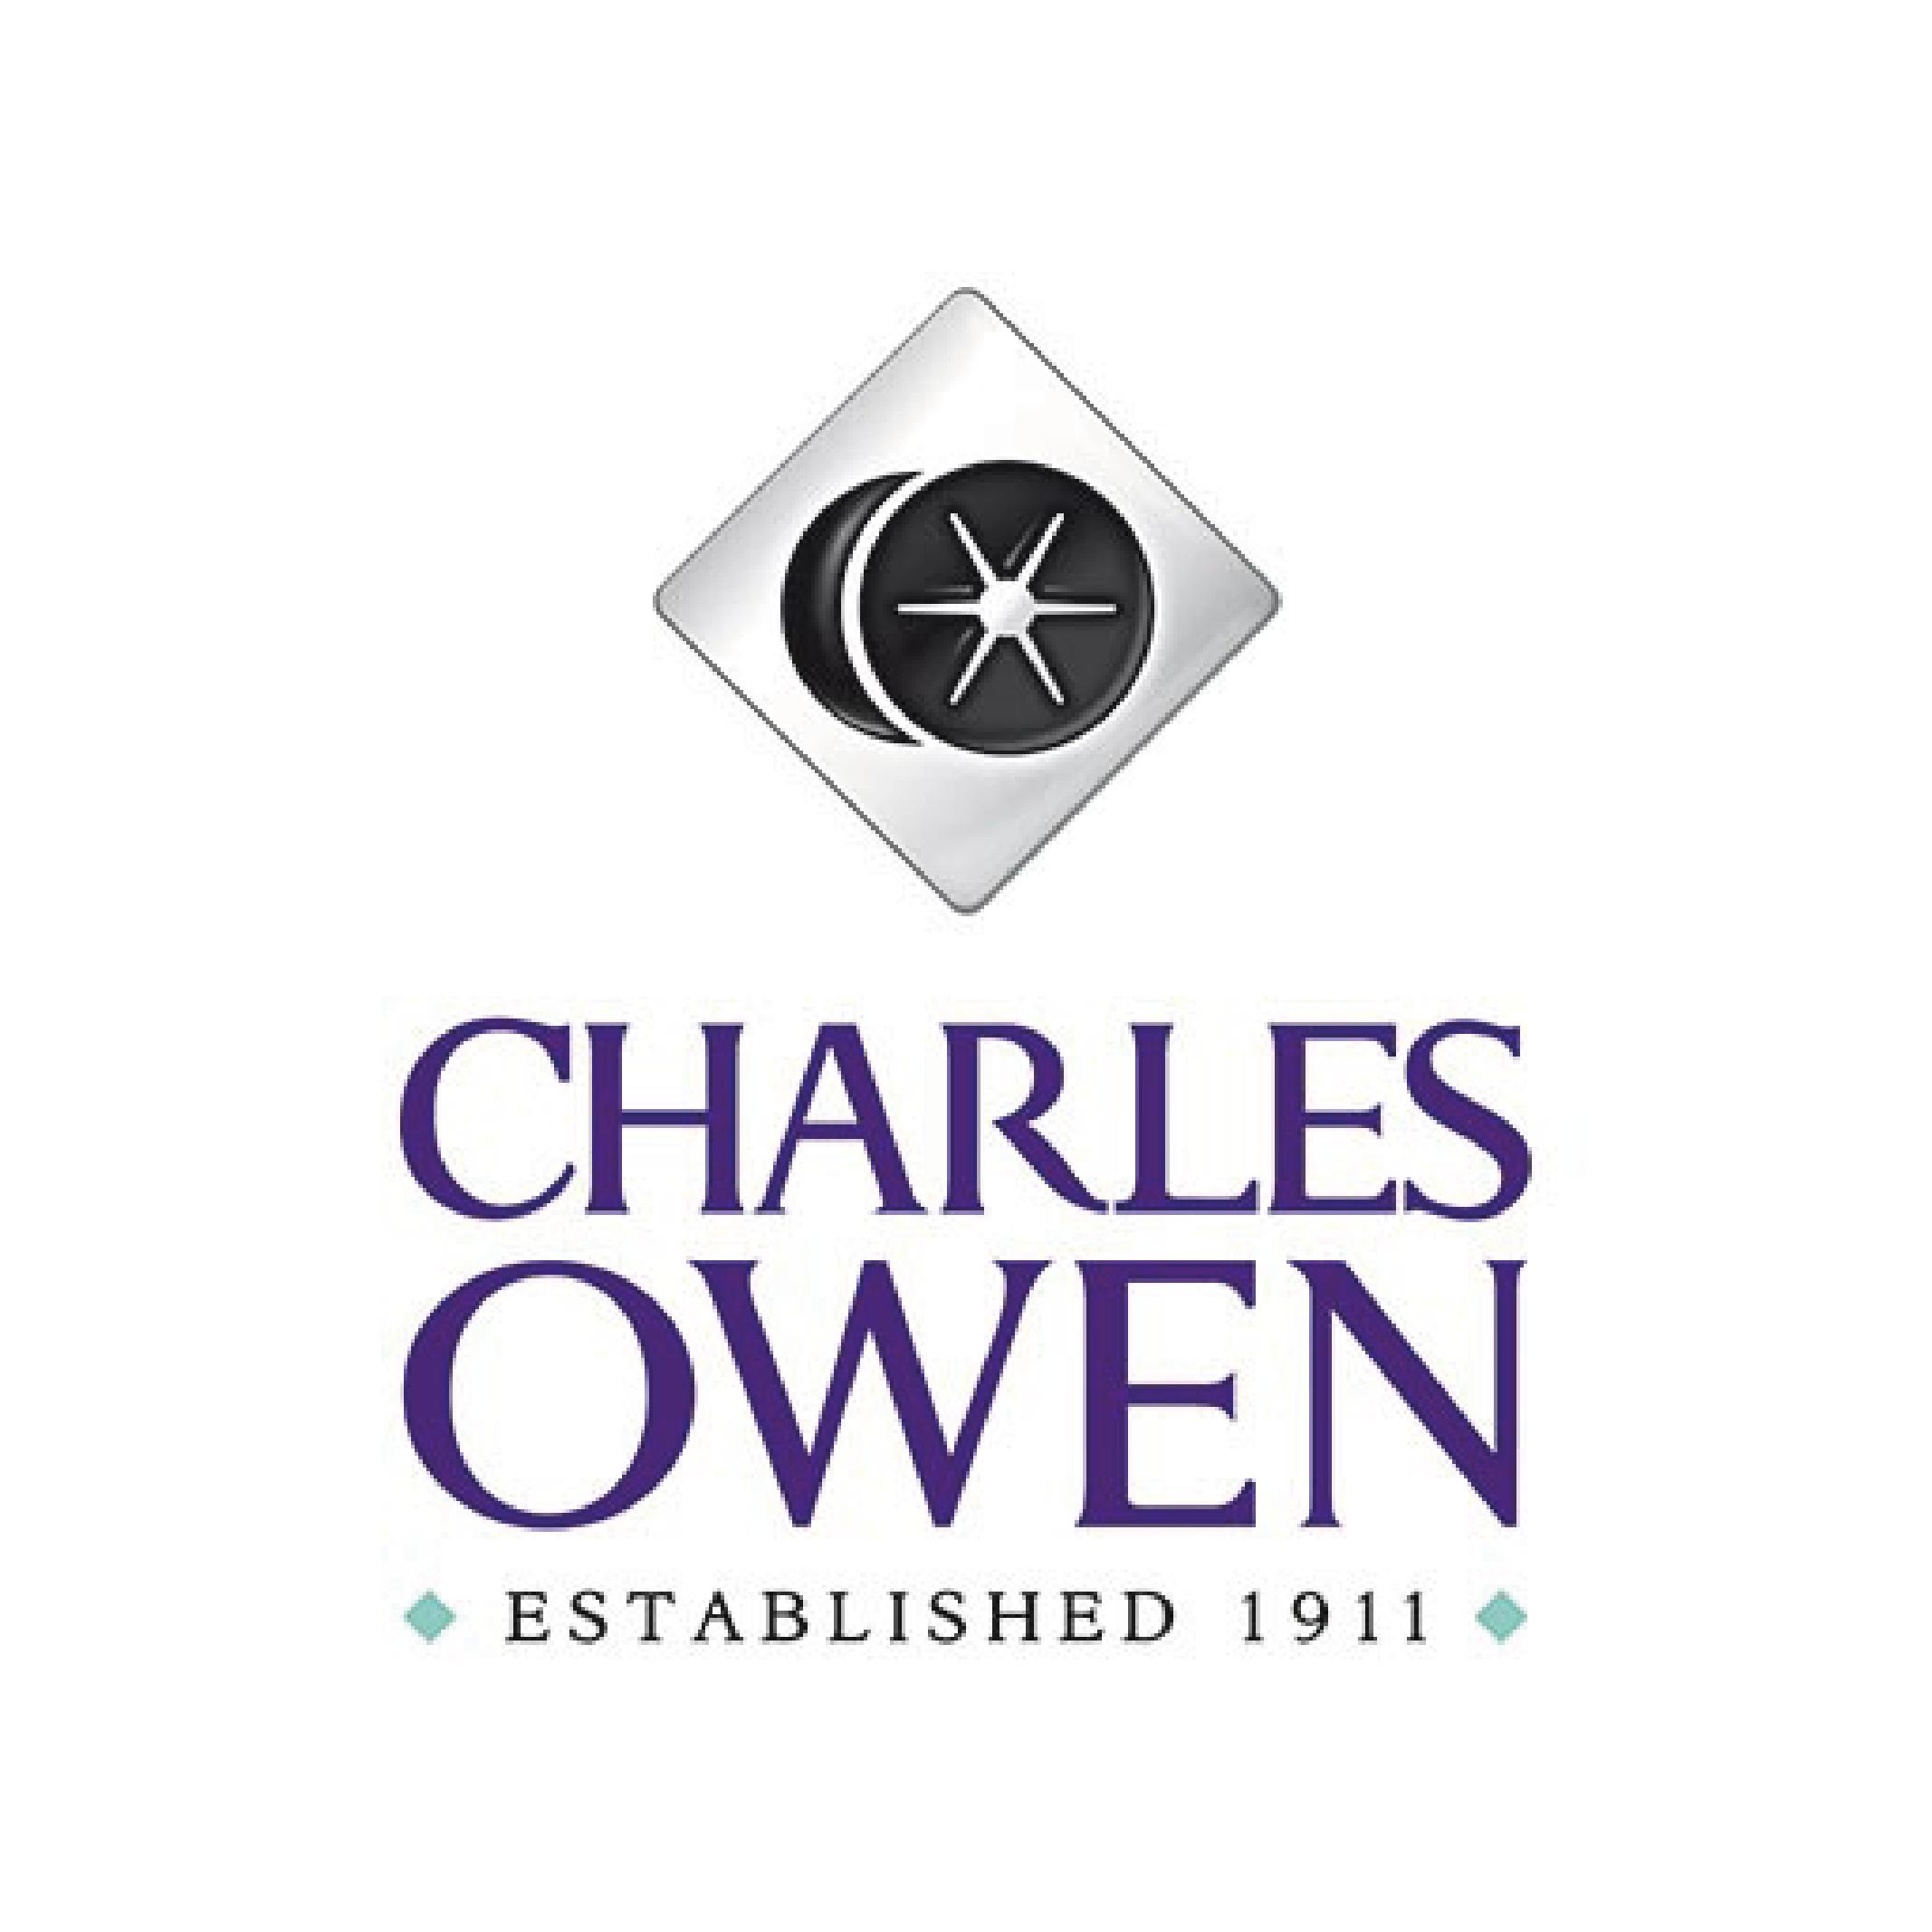 Charles owen HVP Mensport